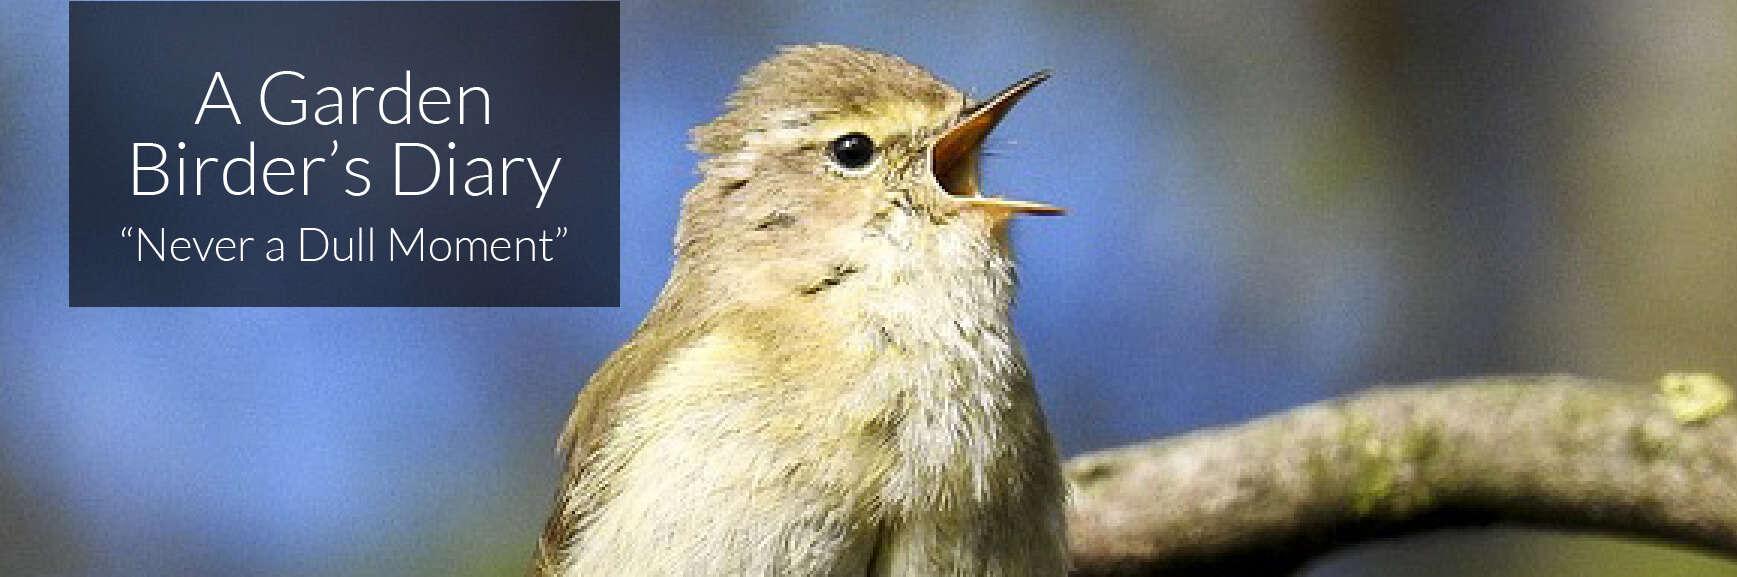 A Garden Birder's Diary – Never a Dull Moment